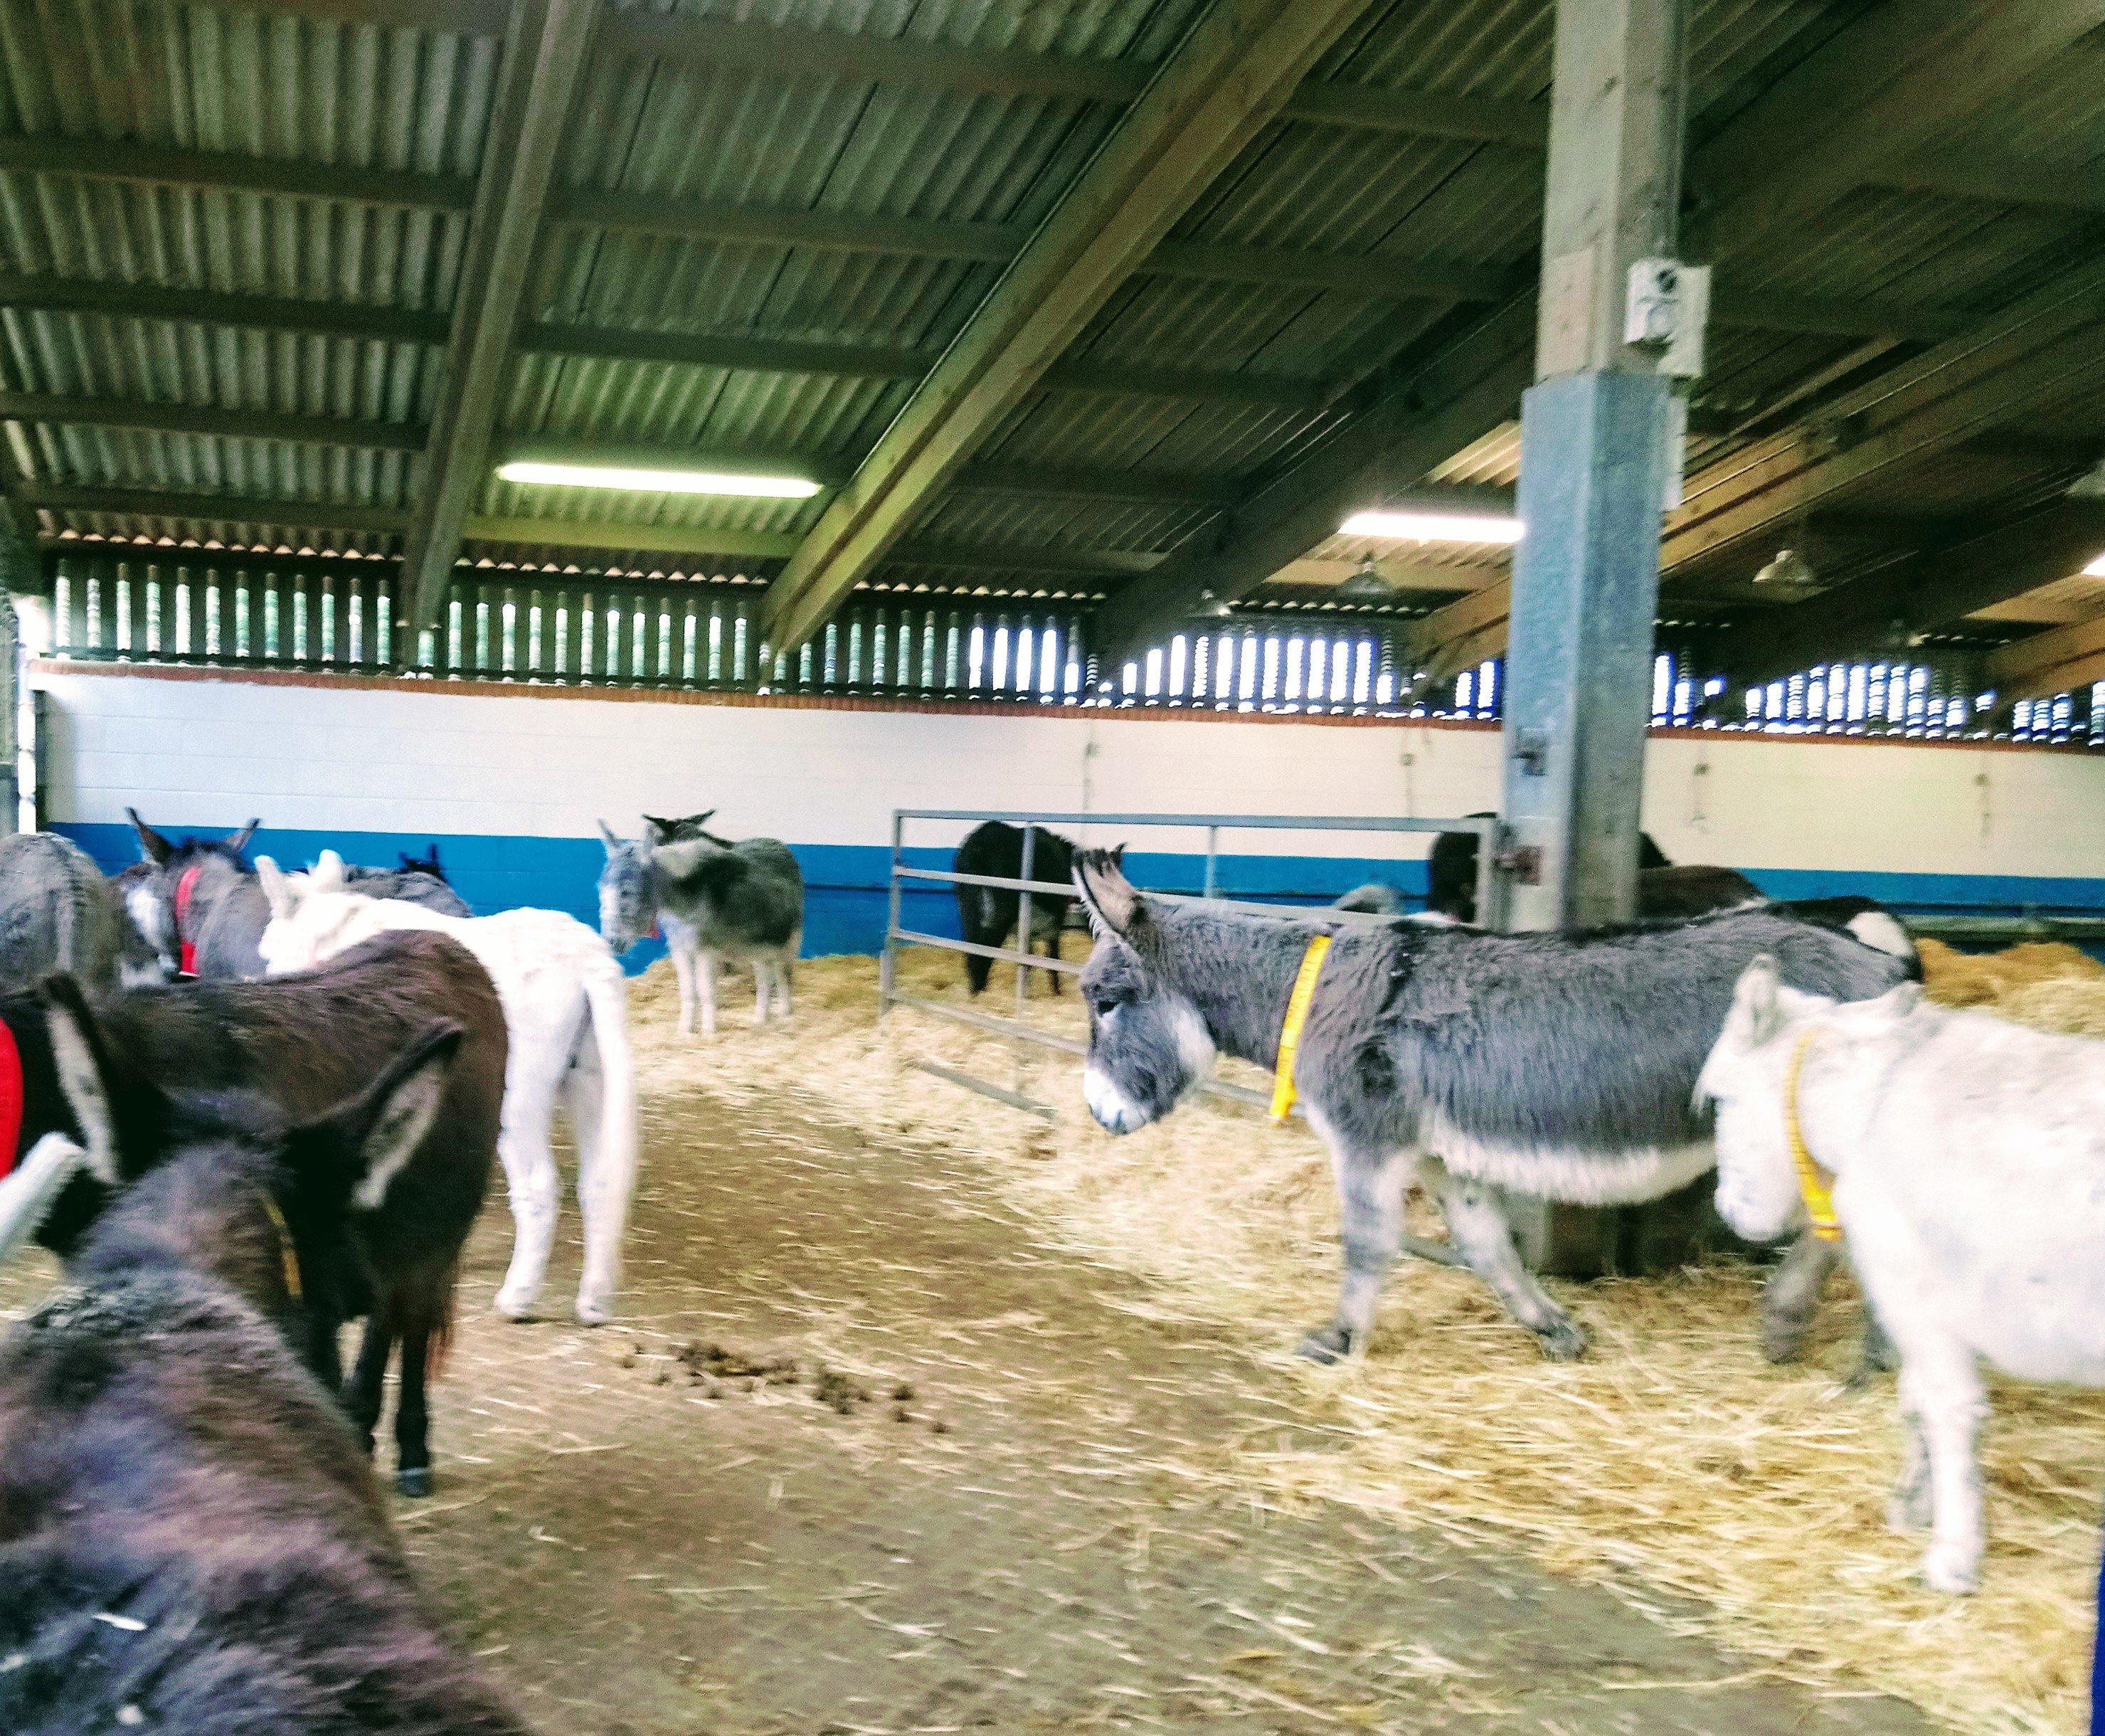 Donkeys inside at Sidmouth Donkey Sanctuary